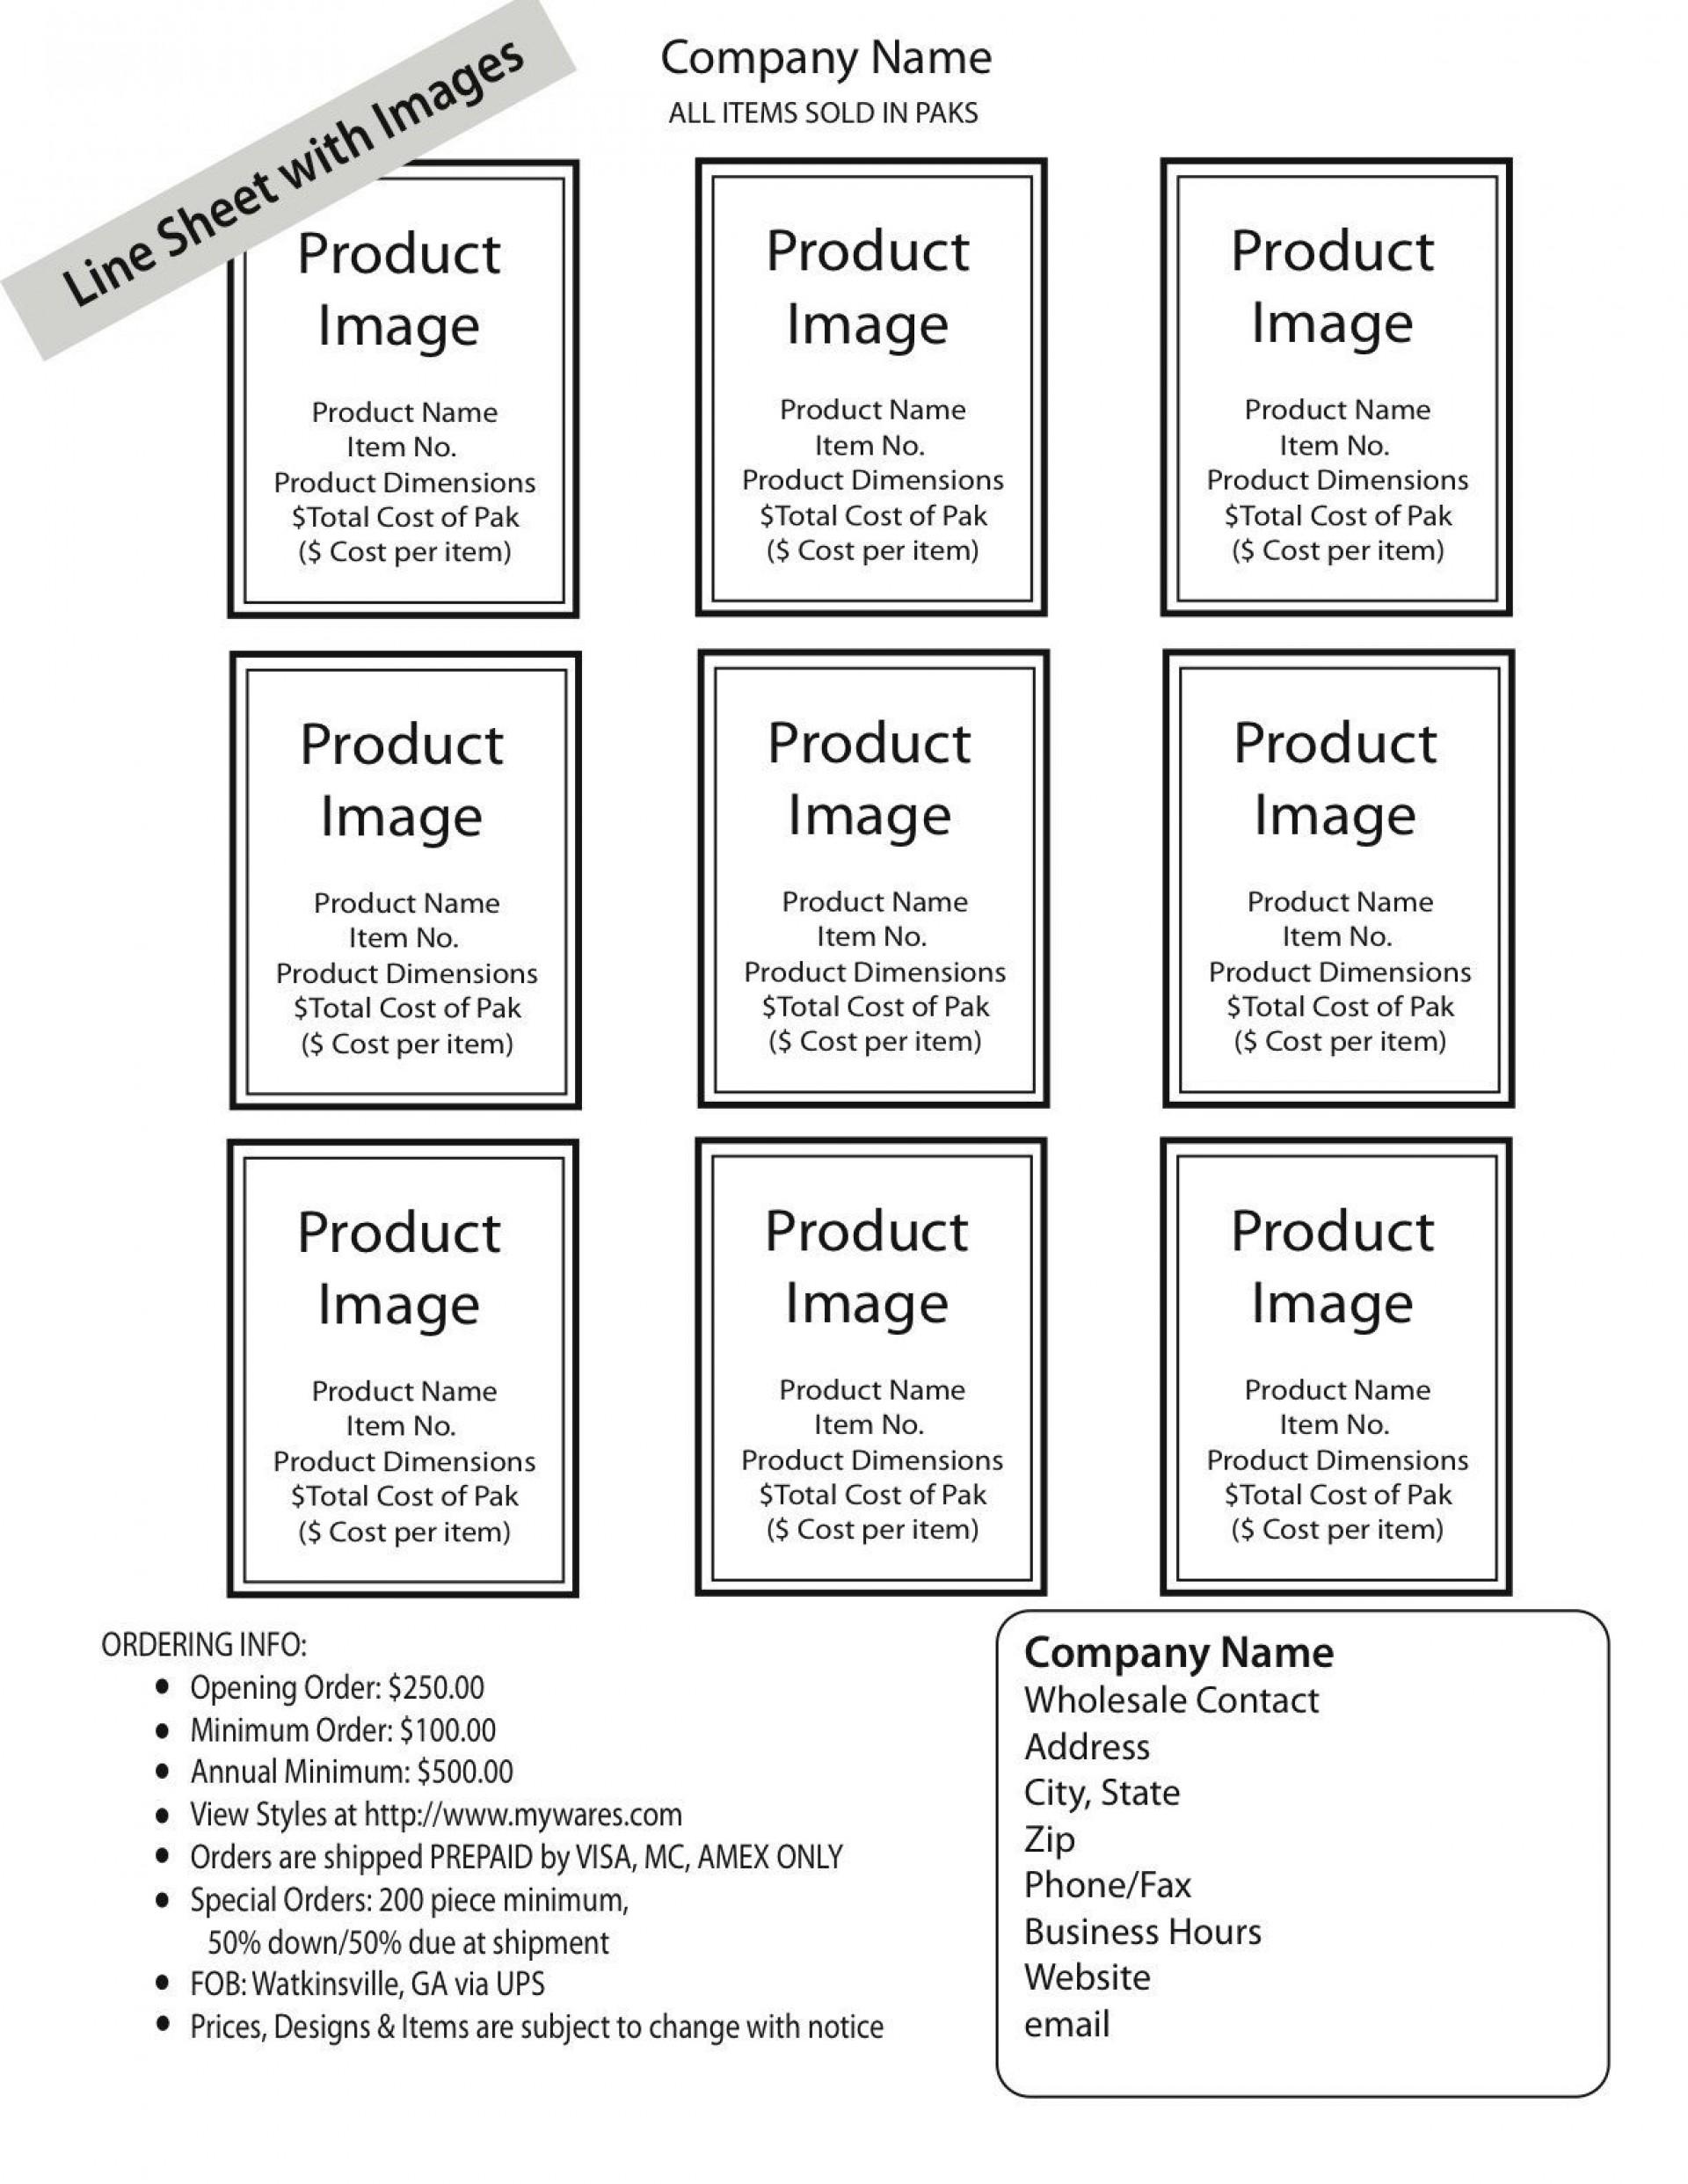 004 Awesome Wholesale Line Sheet Template Idea  Fashion Free Excel1920